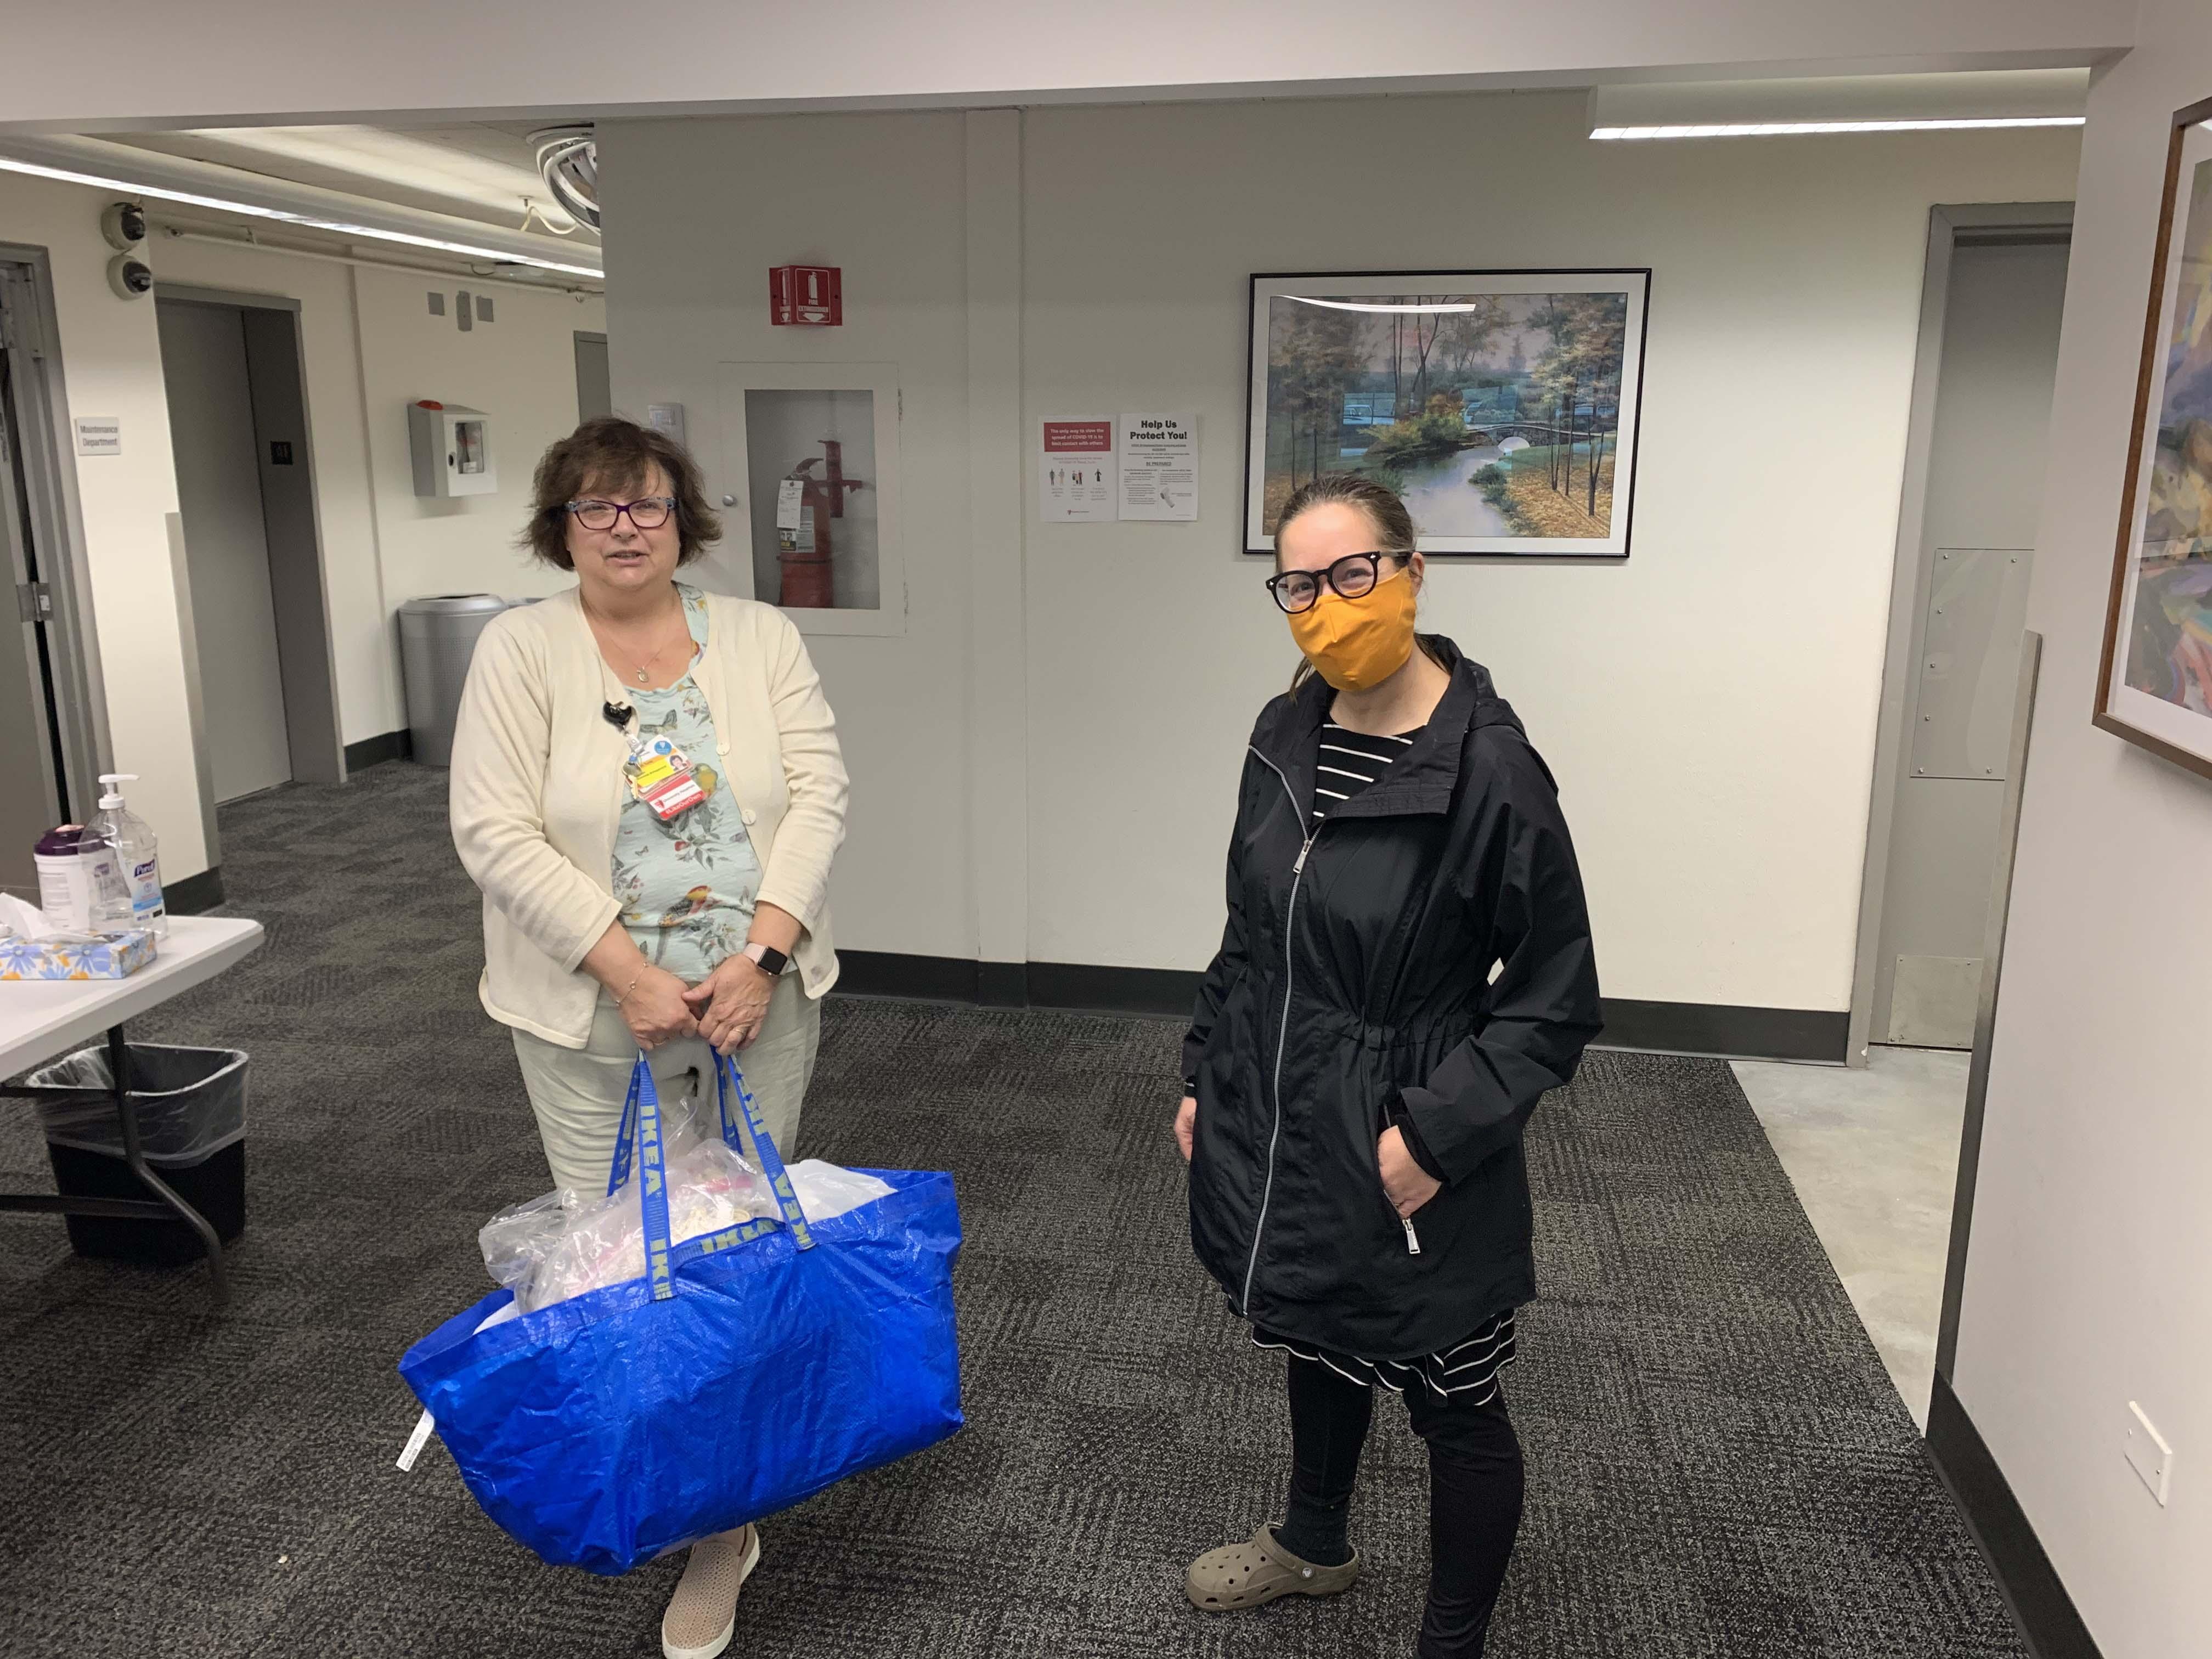 Professor Linda Ohrn-McDaniel Delivers a batch of Masks to University Hospital.